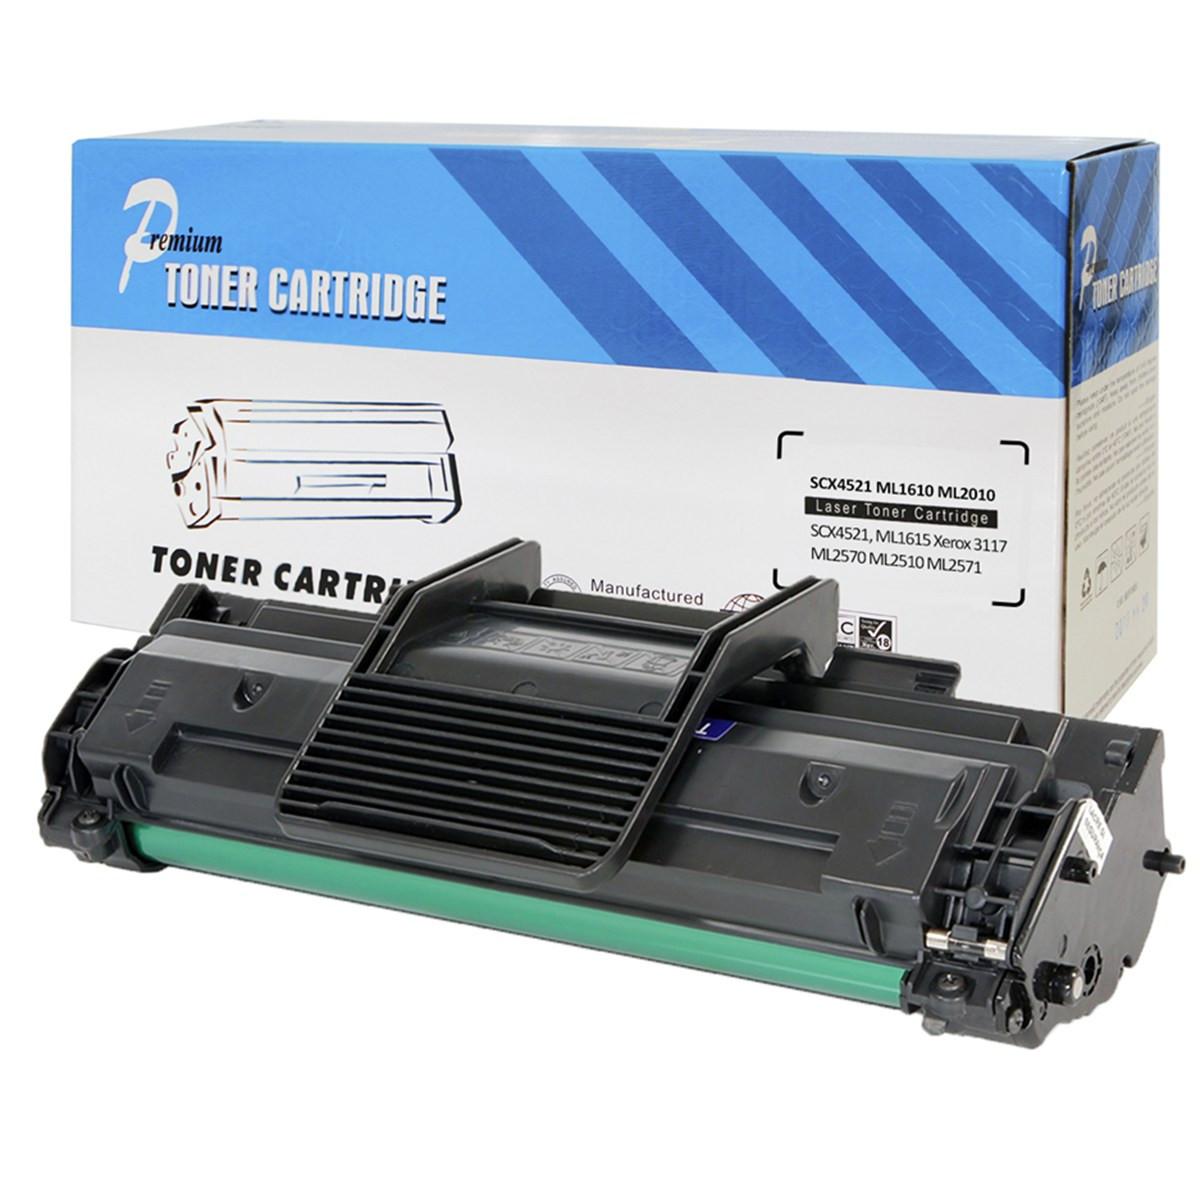 Toner Compatível com Xerox 3117 3122 3124 3125 | 106R01159 | Premium 2k